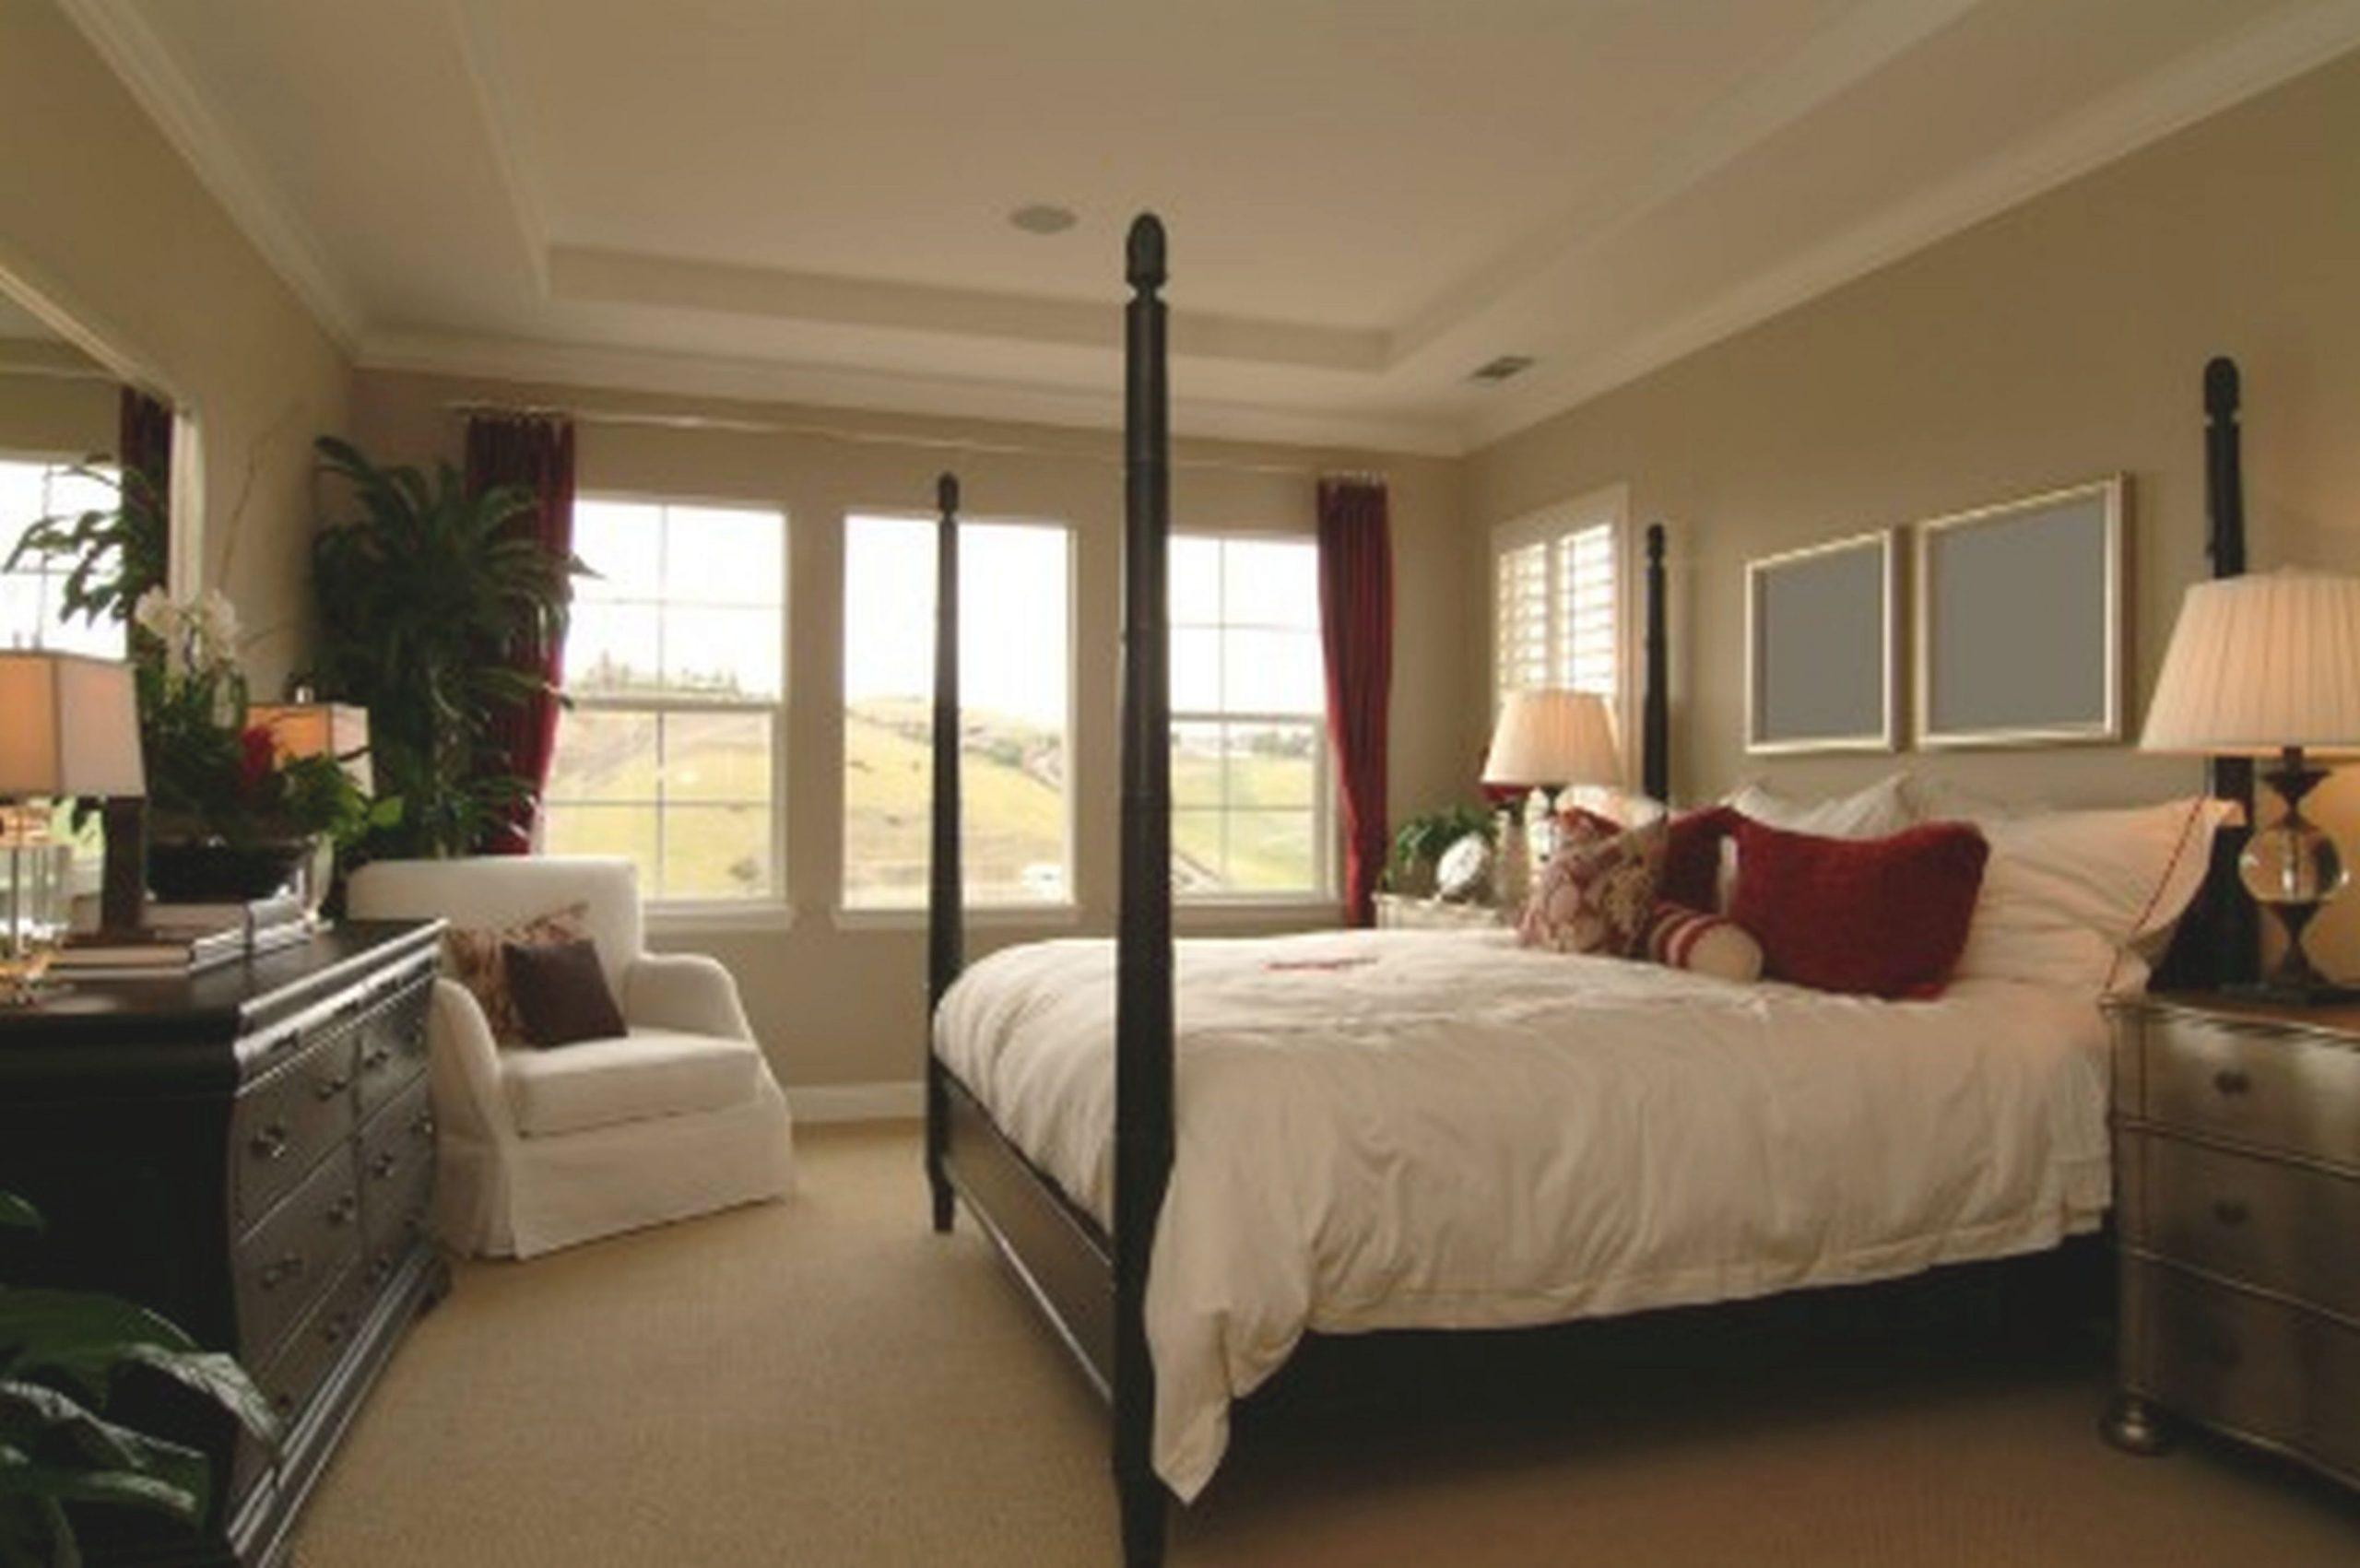 10 Best Master Bedroom Decor Ideas – Best Interior Decor intended for Unique Home Decor Ideas For Master Bedroom